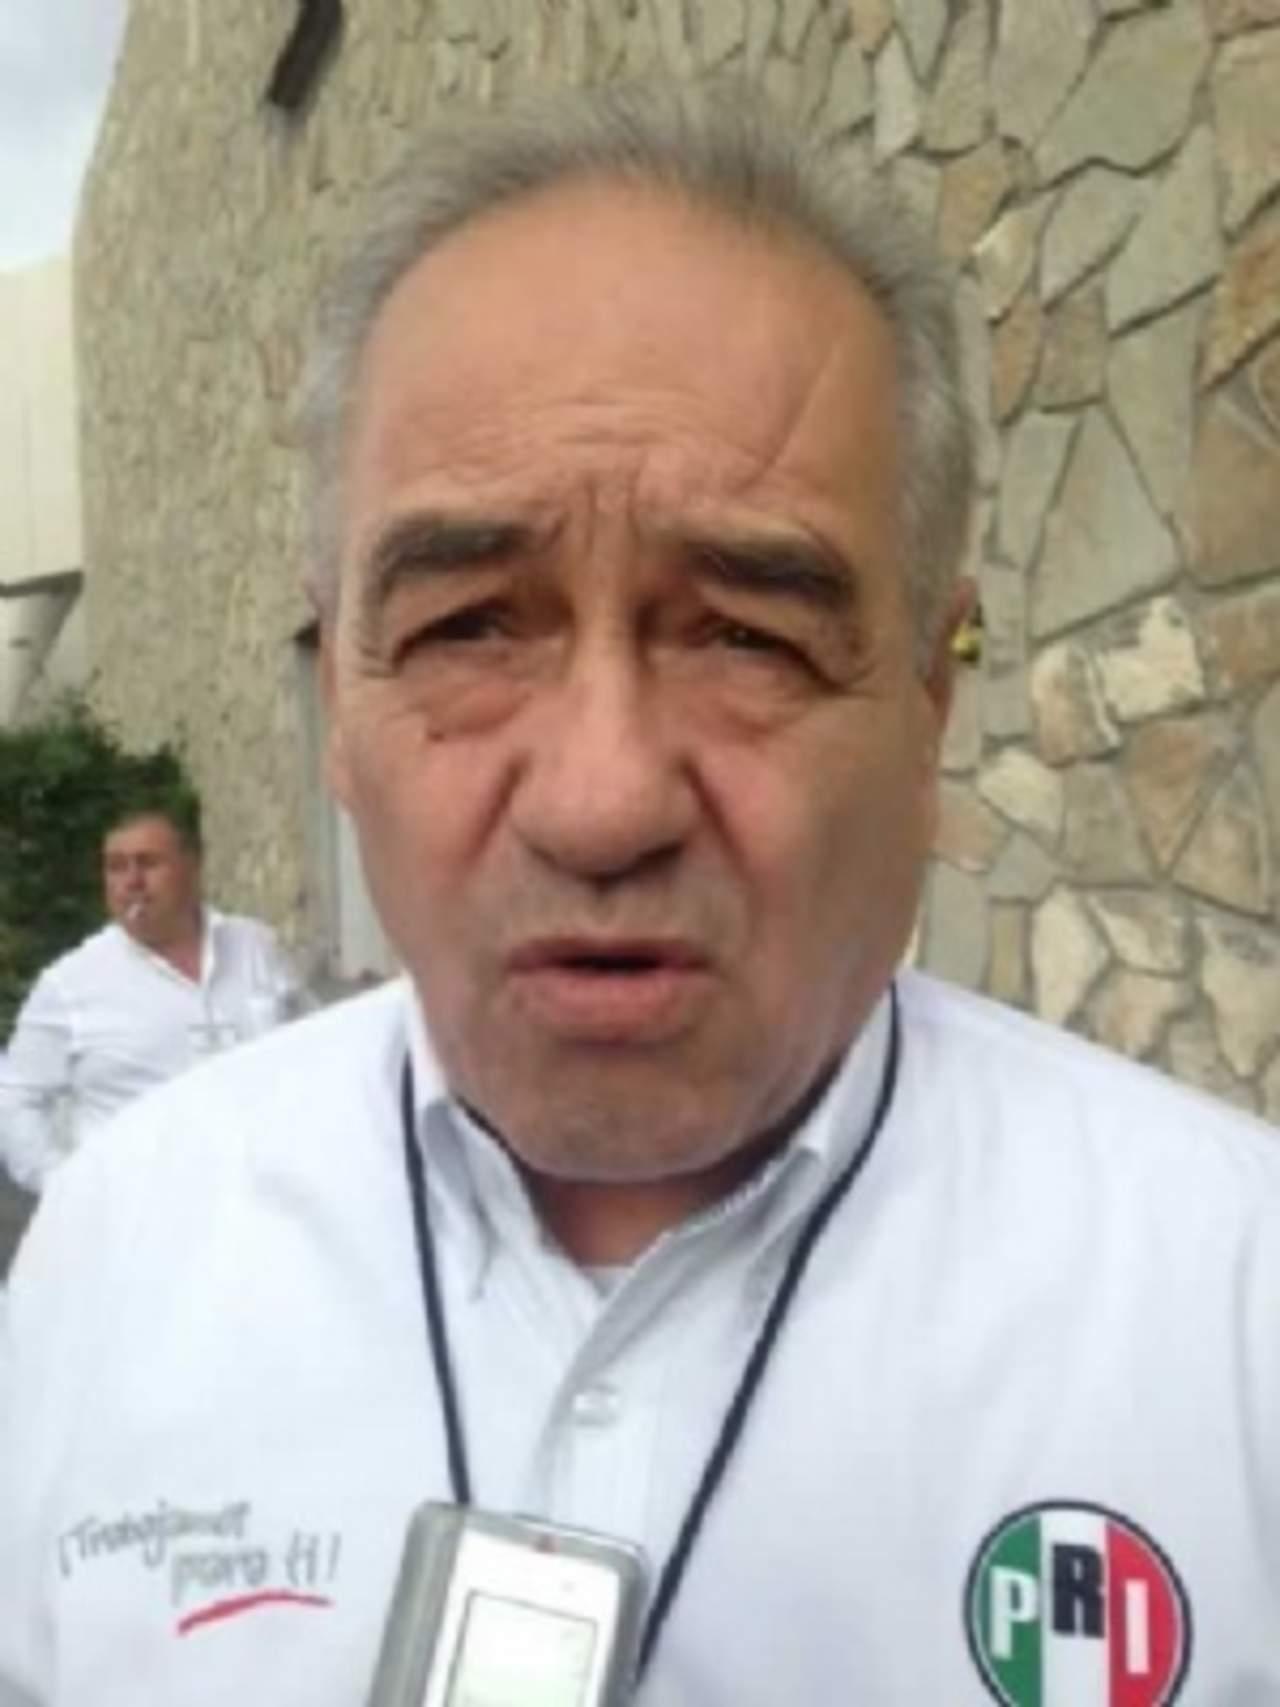 Fallece el exalcalde de Torreón, Manlio Fabio Gómez Uranga